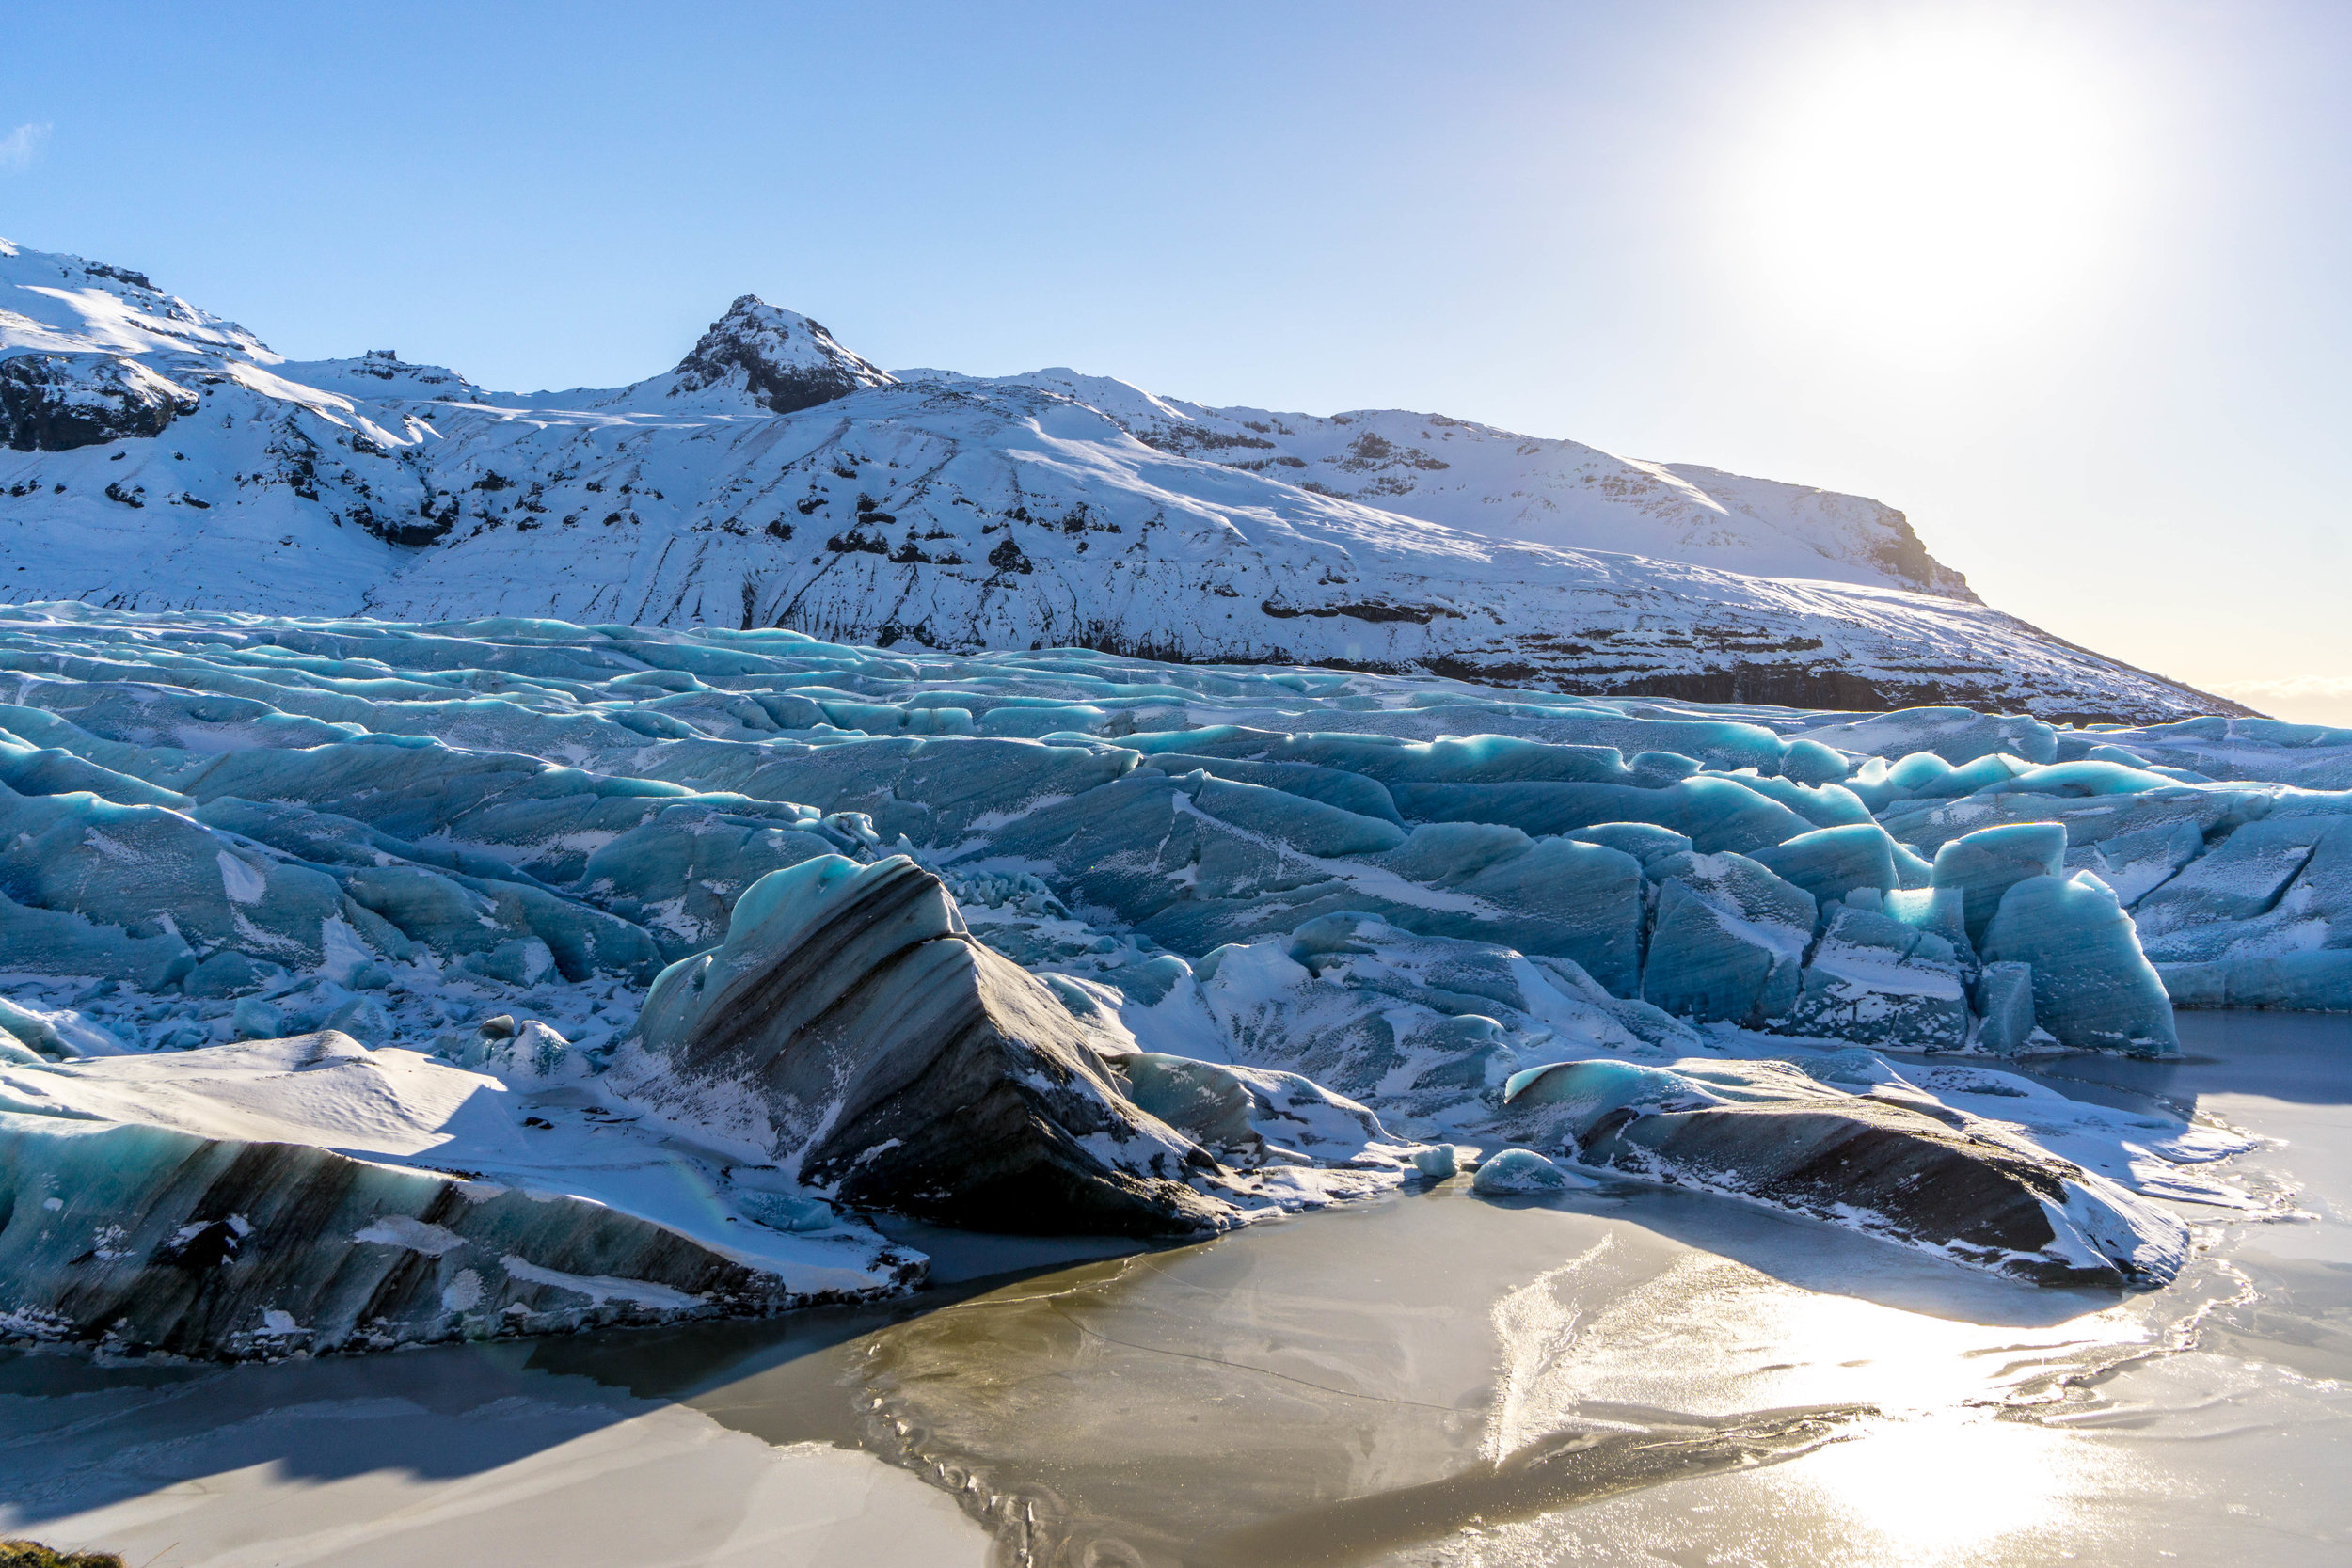 What a surreal sight. Glaciers in Jökulsárlón.